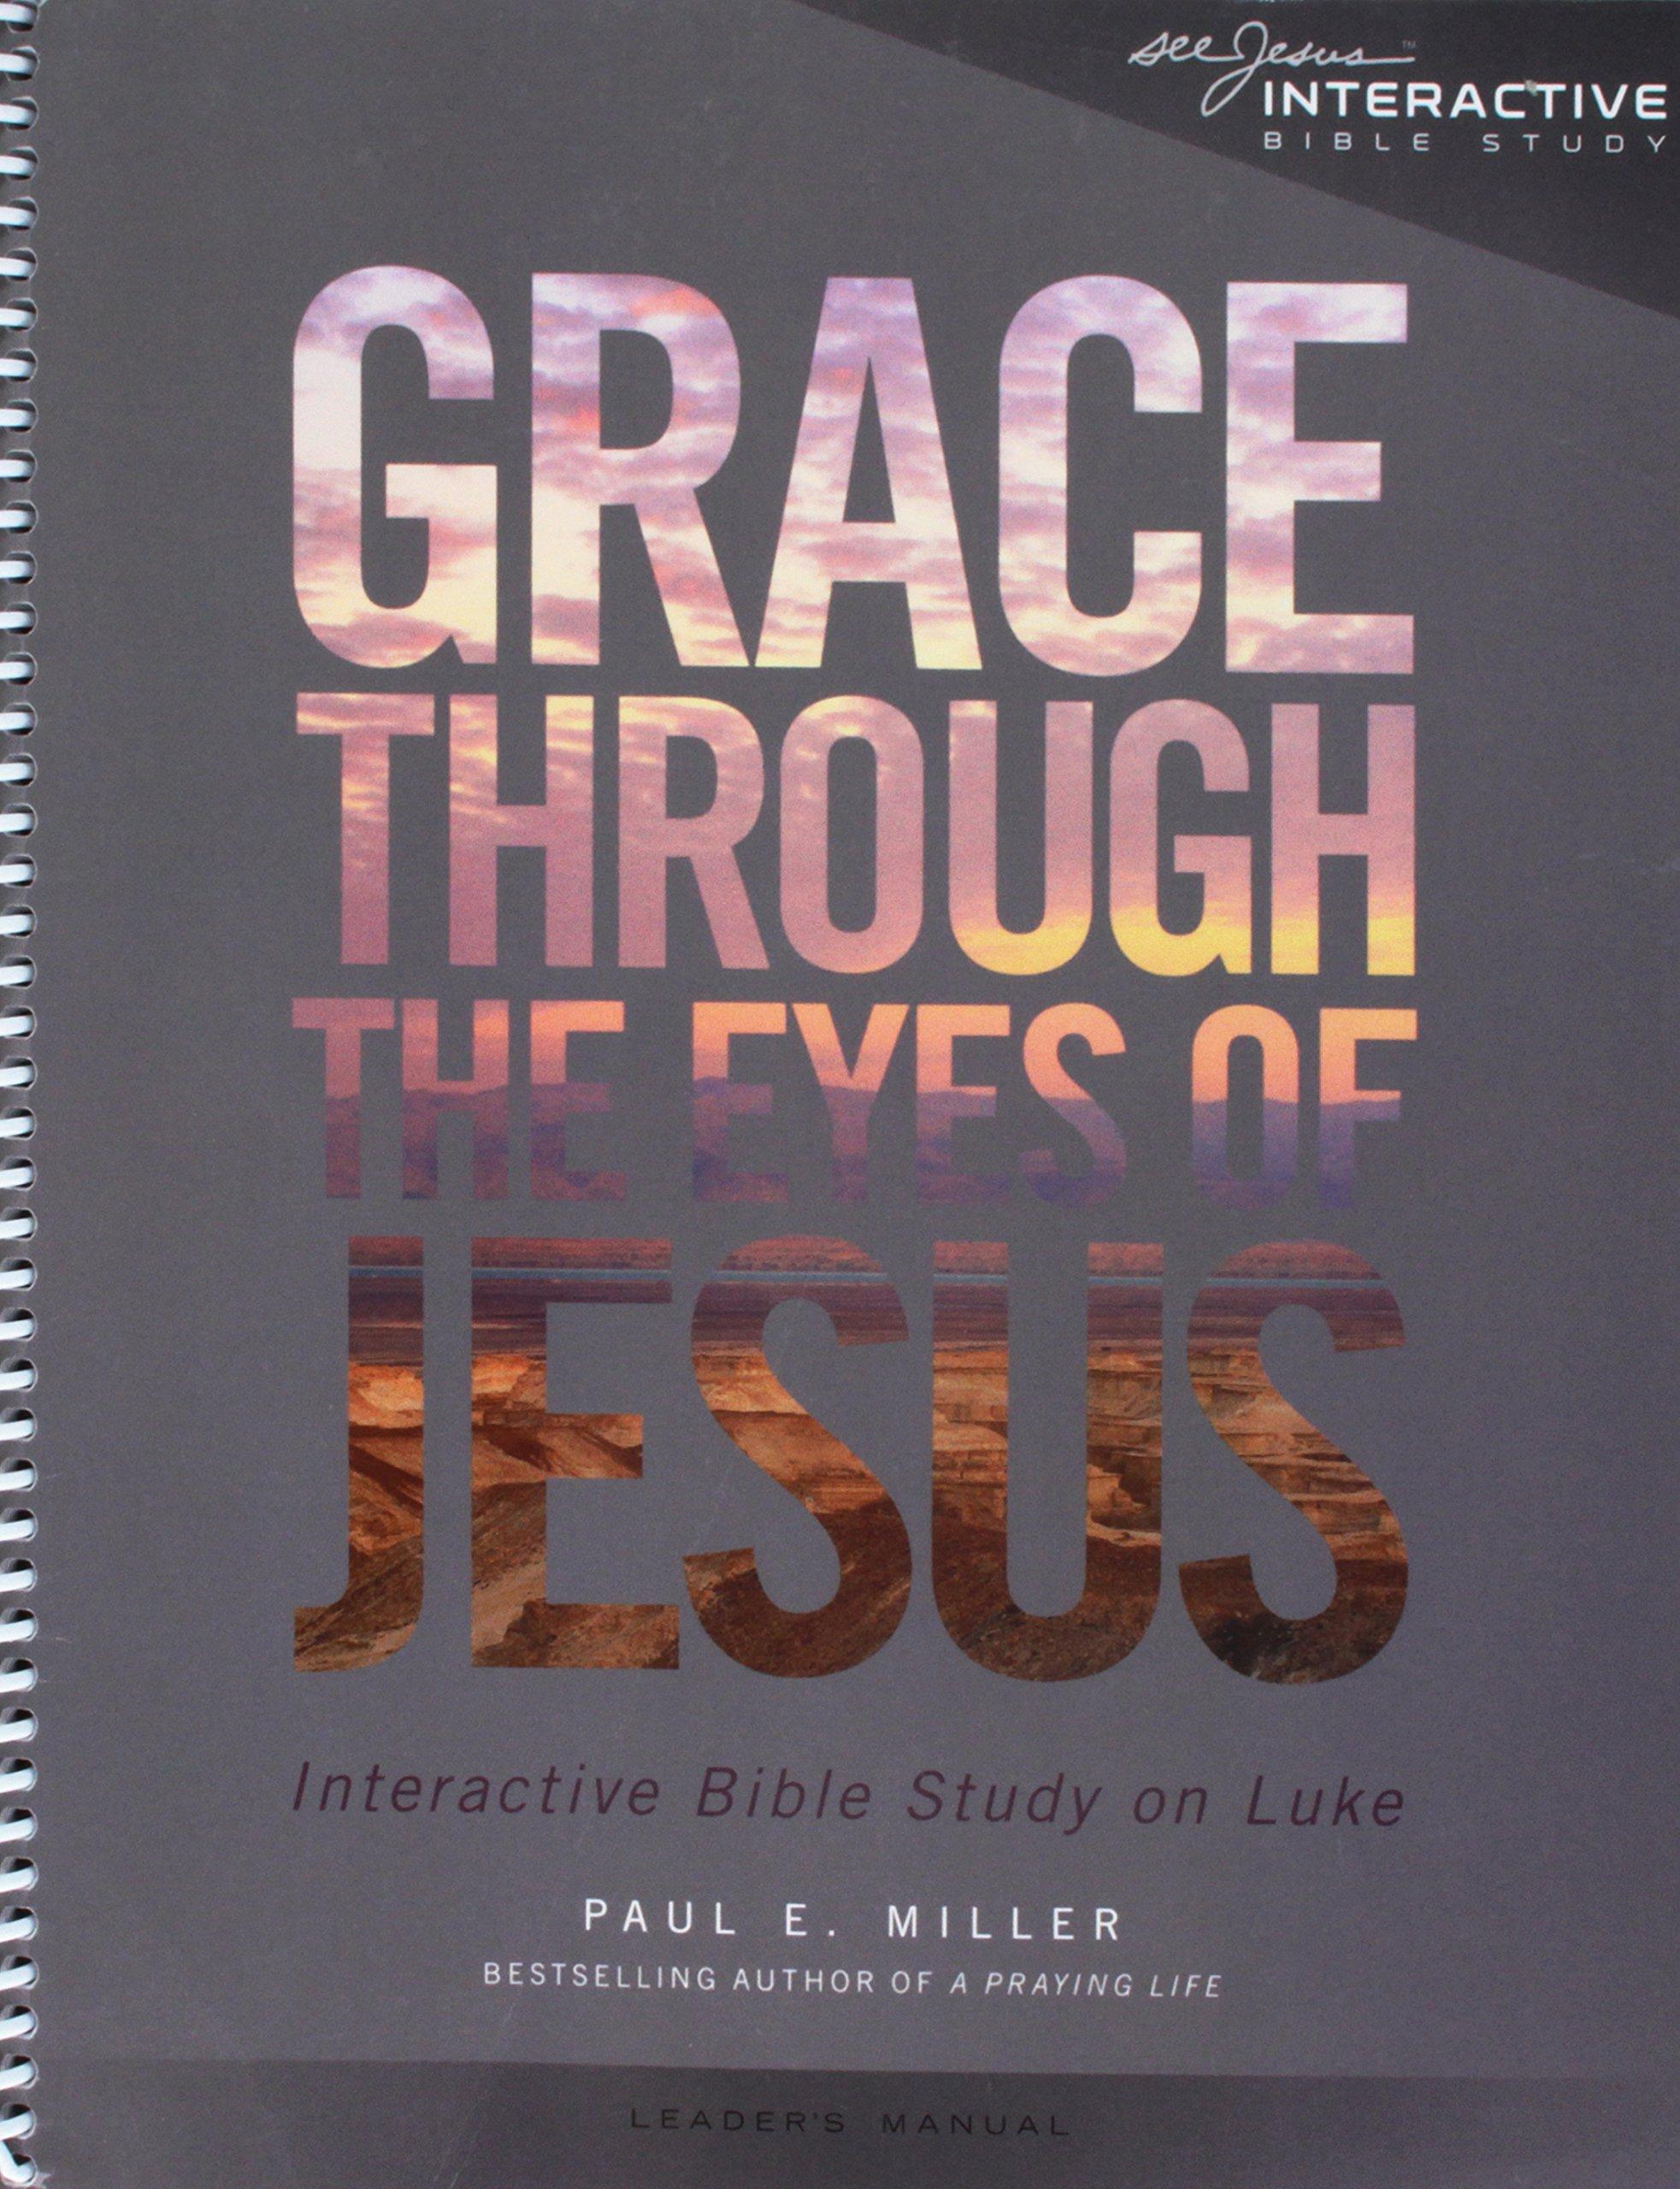 Grace Through the Eyes of Jesus: An Interactive Bible Study on Luke  (Leader's Manual): Paul E. Miller: 9781941178041: Amazon.com: Books